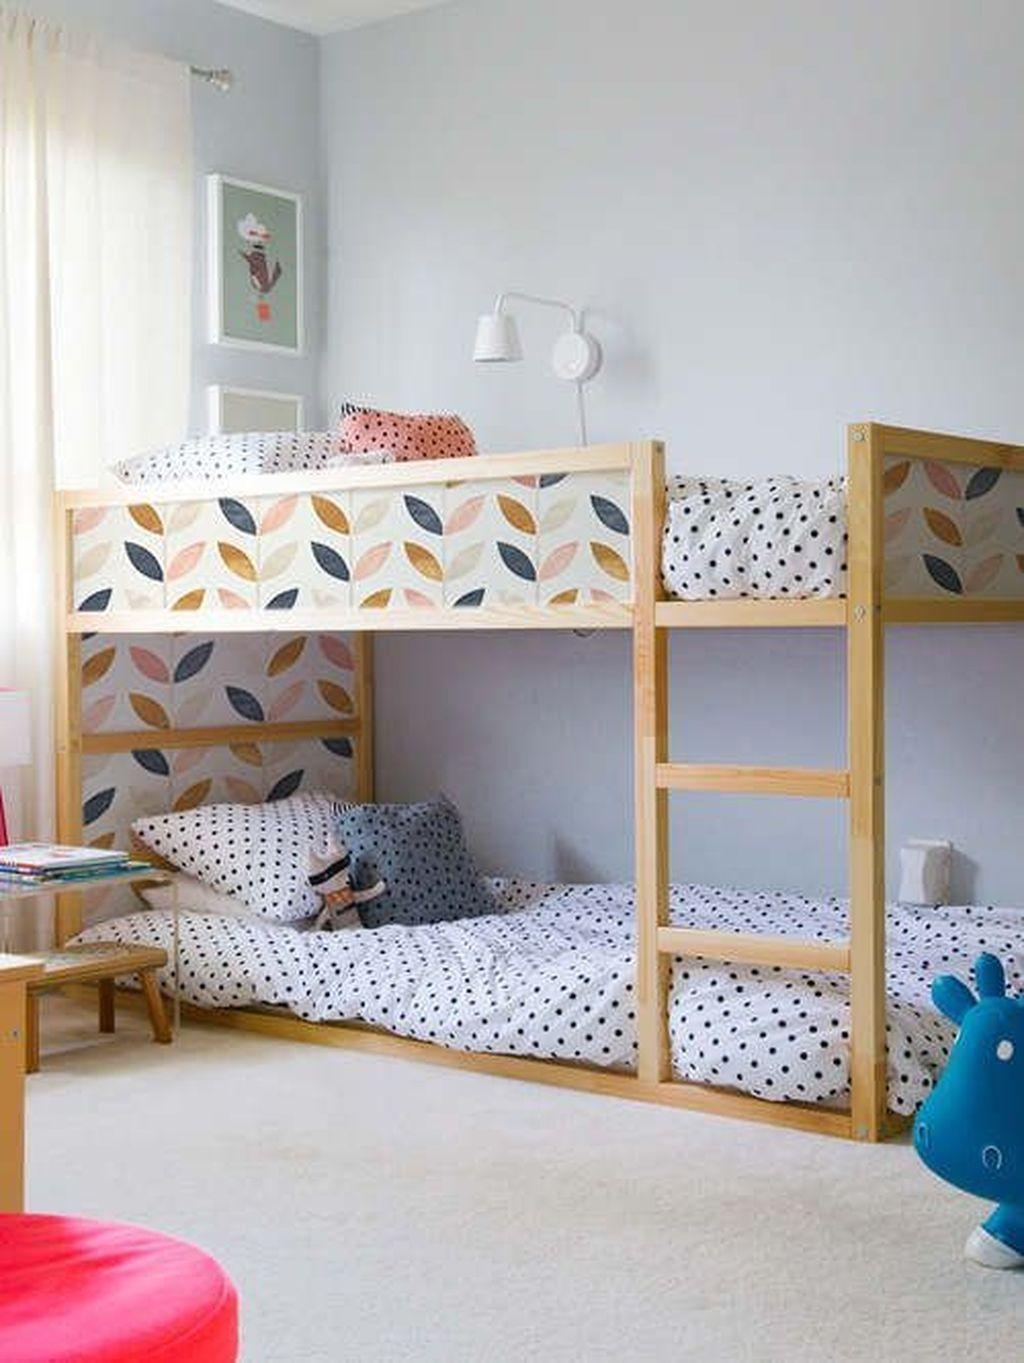 88 Cool Ikea Kura Beds Ideas for